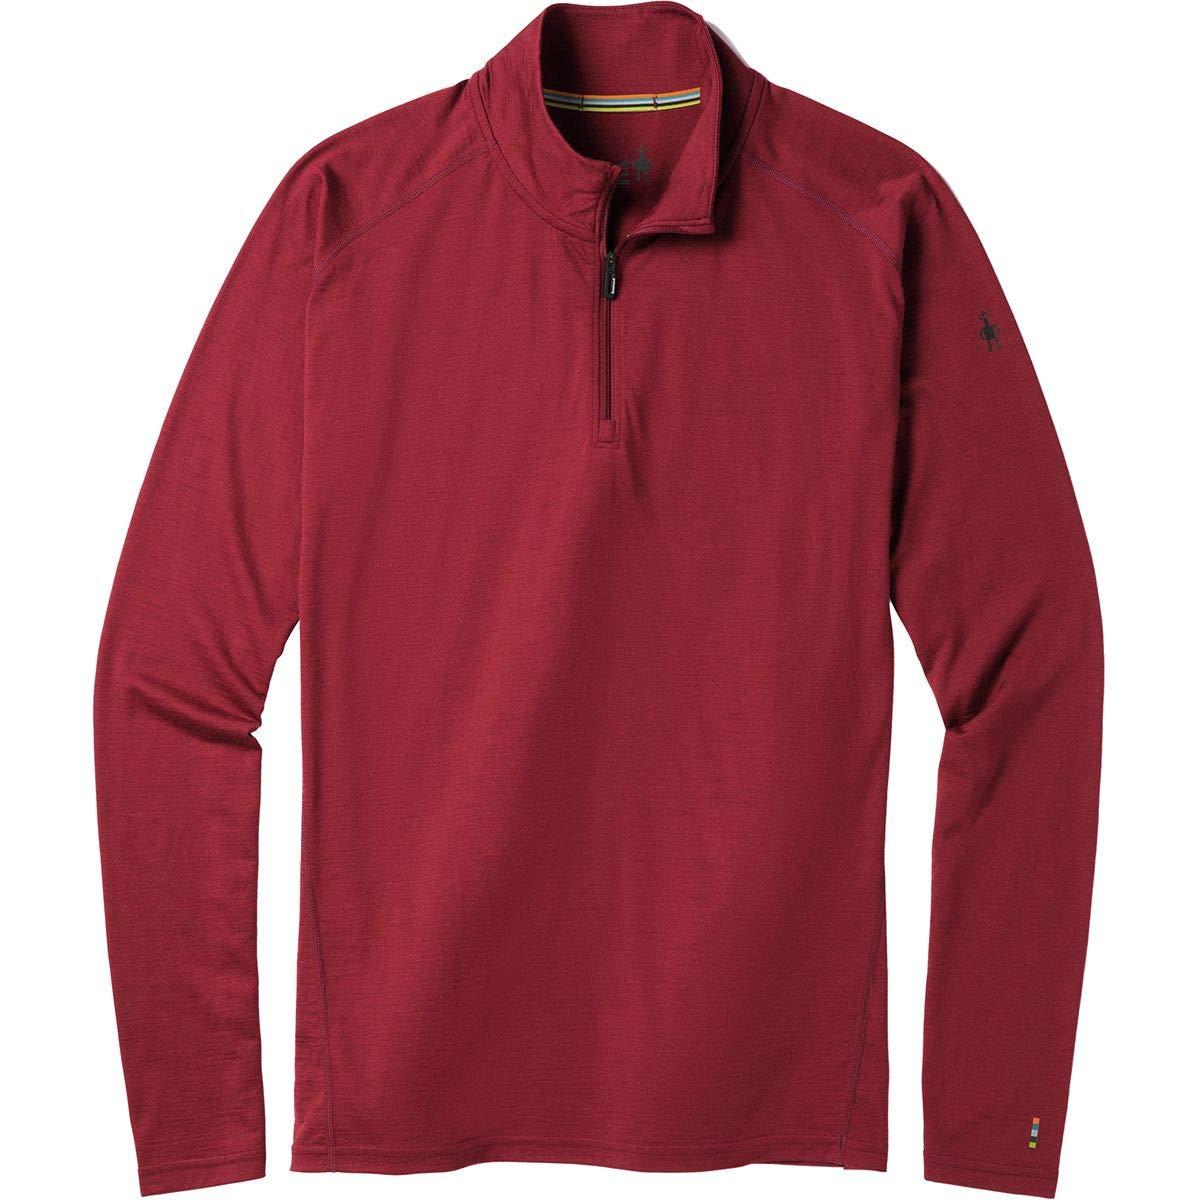 SmartWool Men's Merino 150 Base Layer 1/4 Zip Tibetan Red Medium